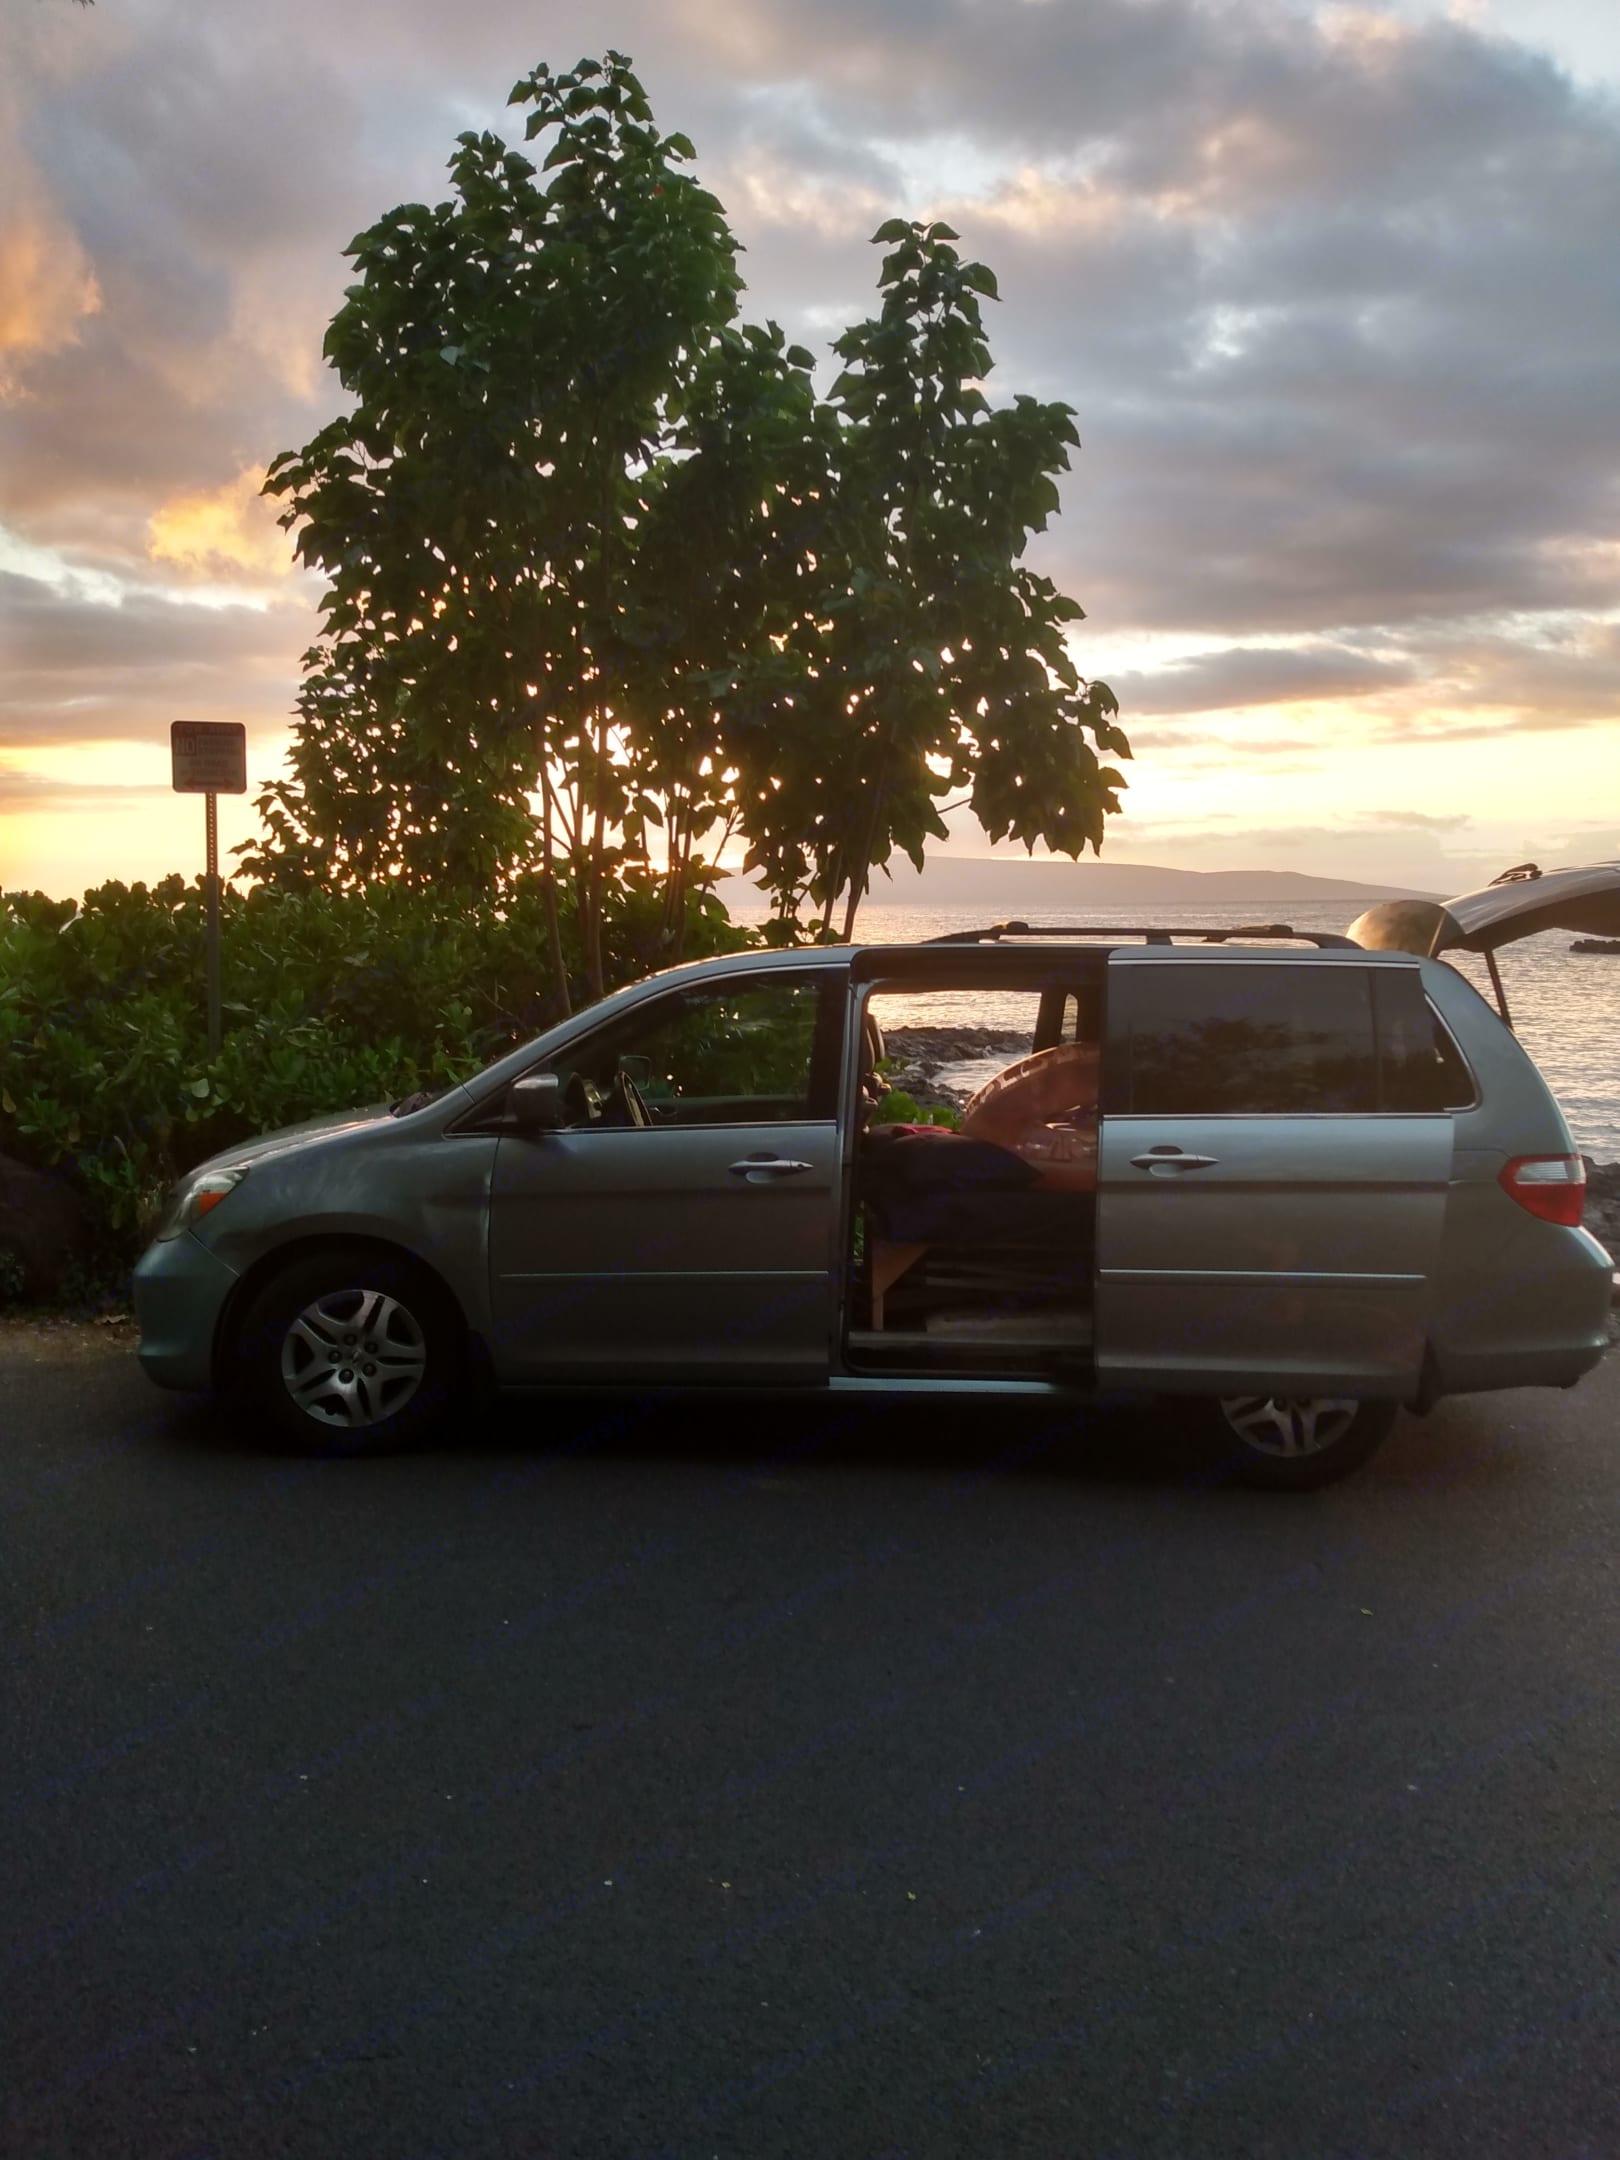 Maui Van Camping for an epic adventure . Honda Odyssey 2005